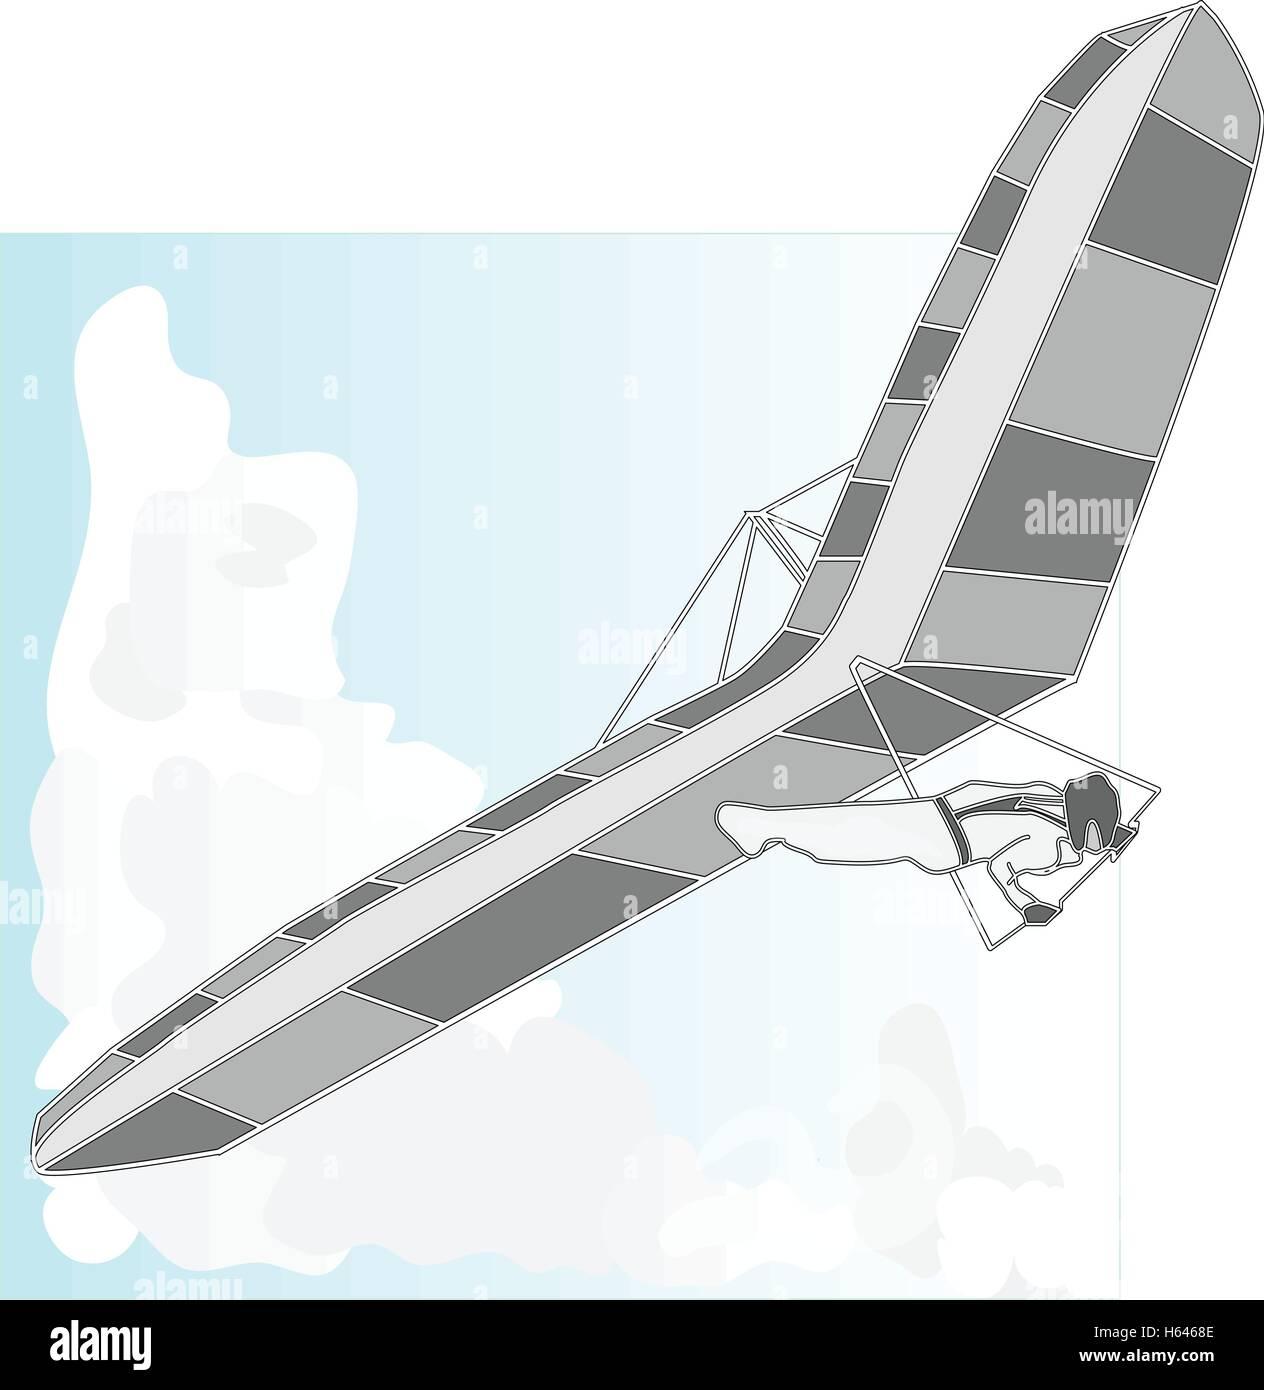 Hang Glider Vector Vectors Stock Photos & Hang Glider Vector